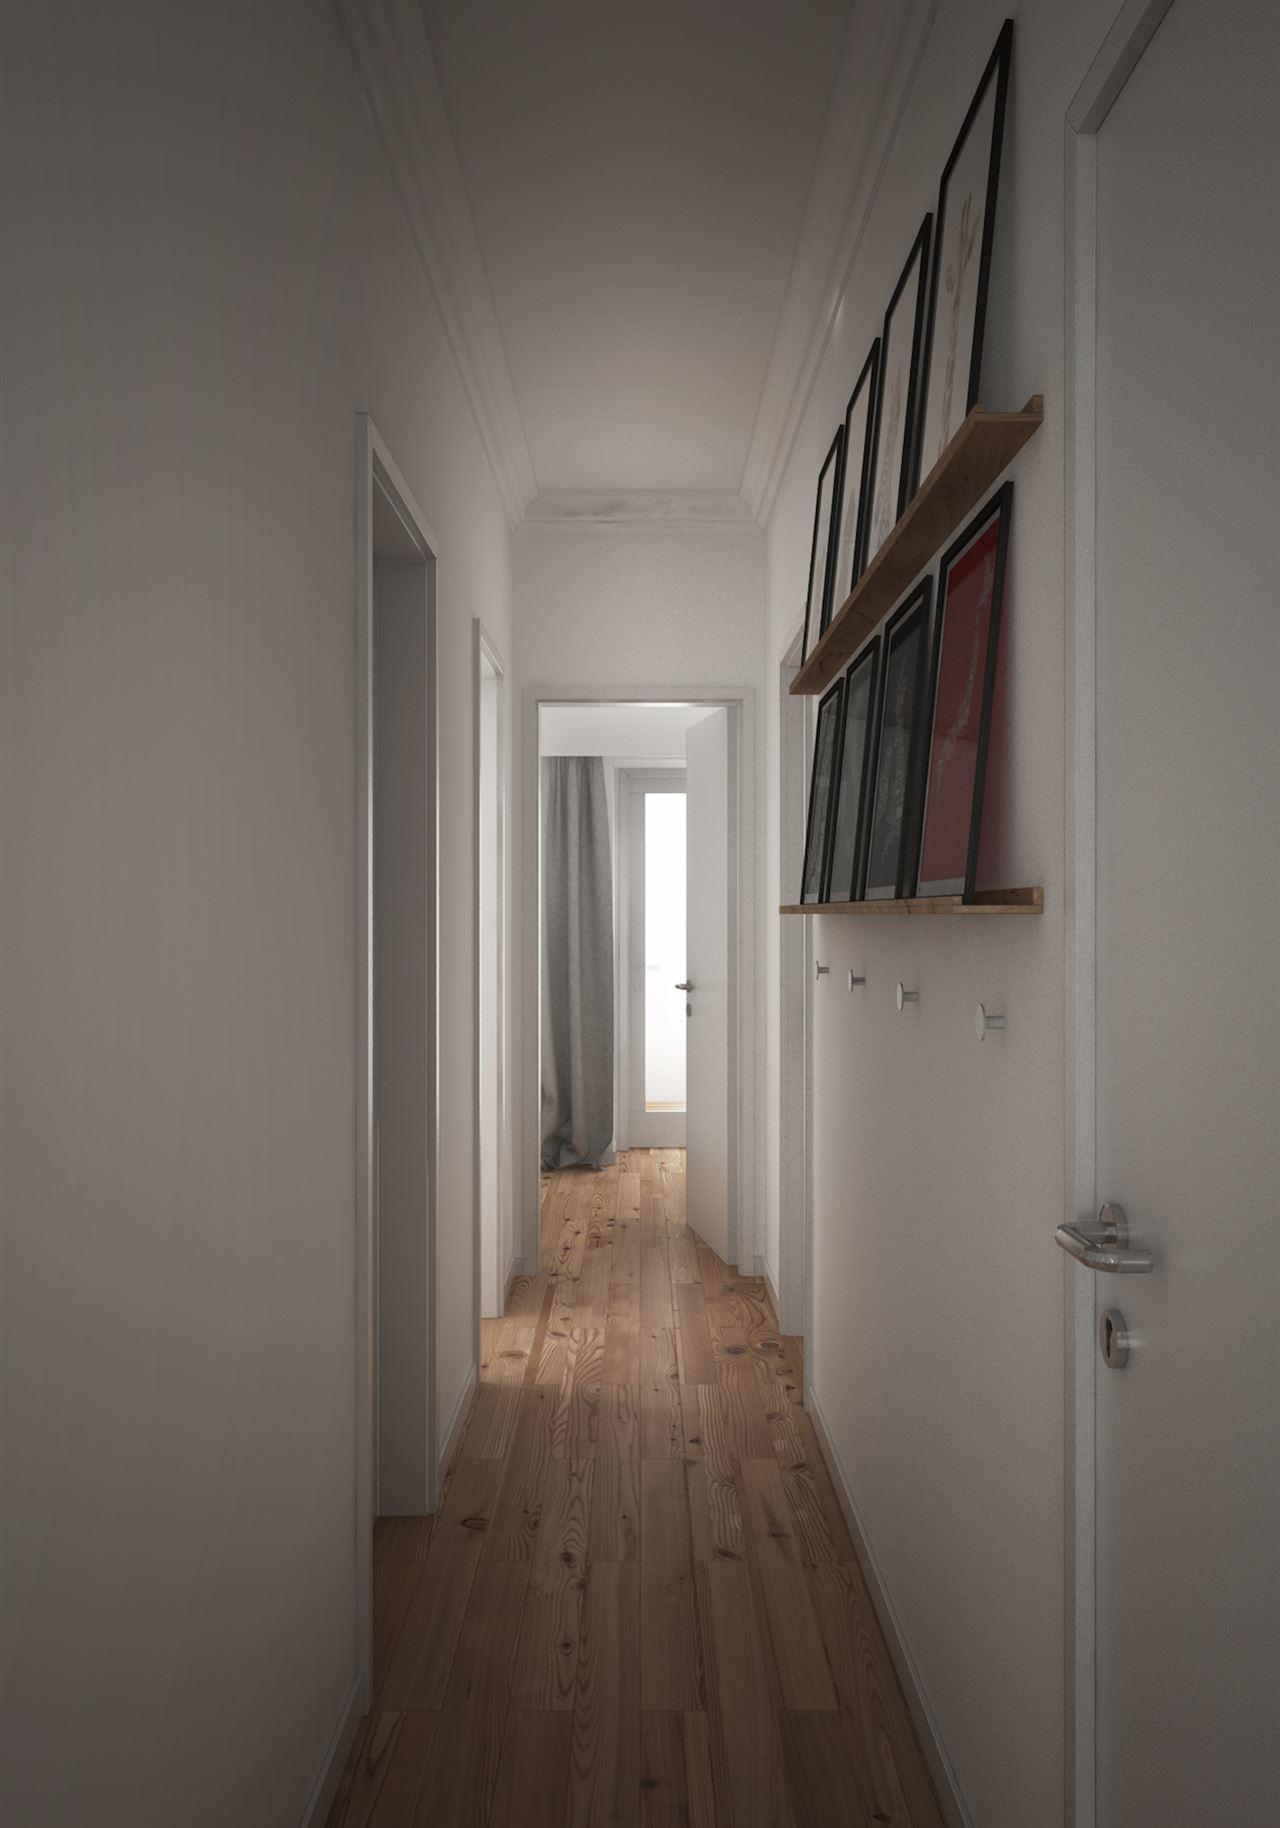 Apartment for Sale at Flat, 2 bedrooms, for Sale Lisboa, Lisboa, 1100-266 Portugal